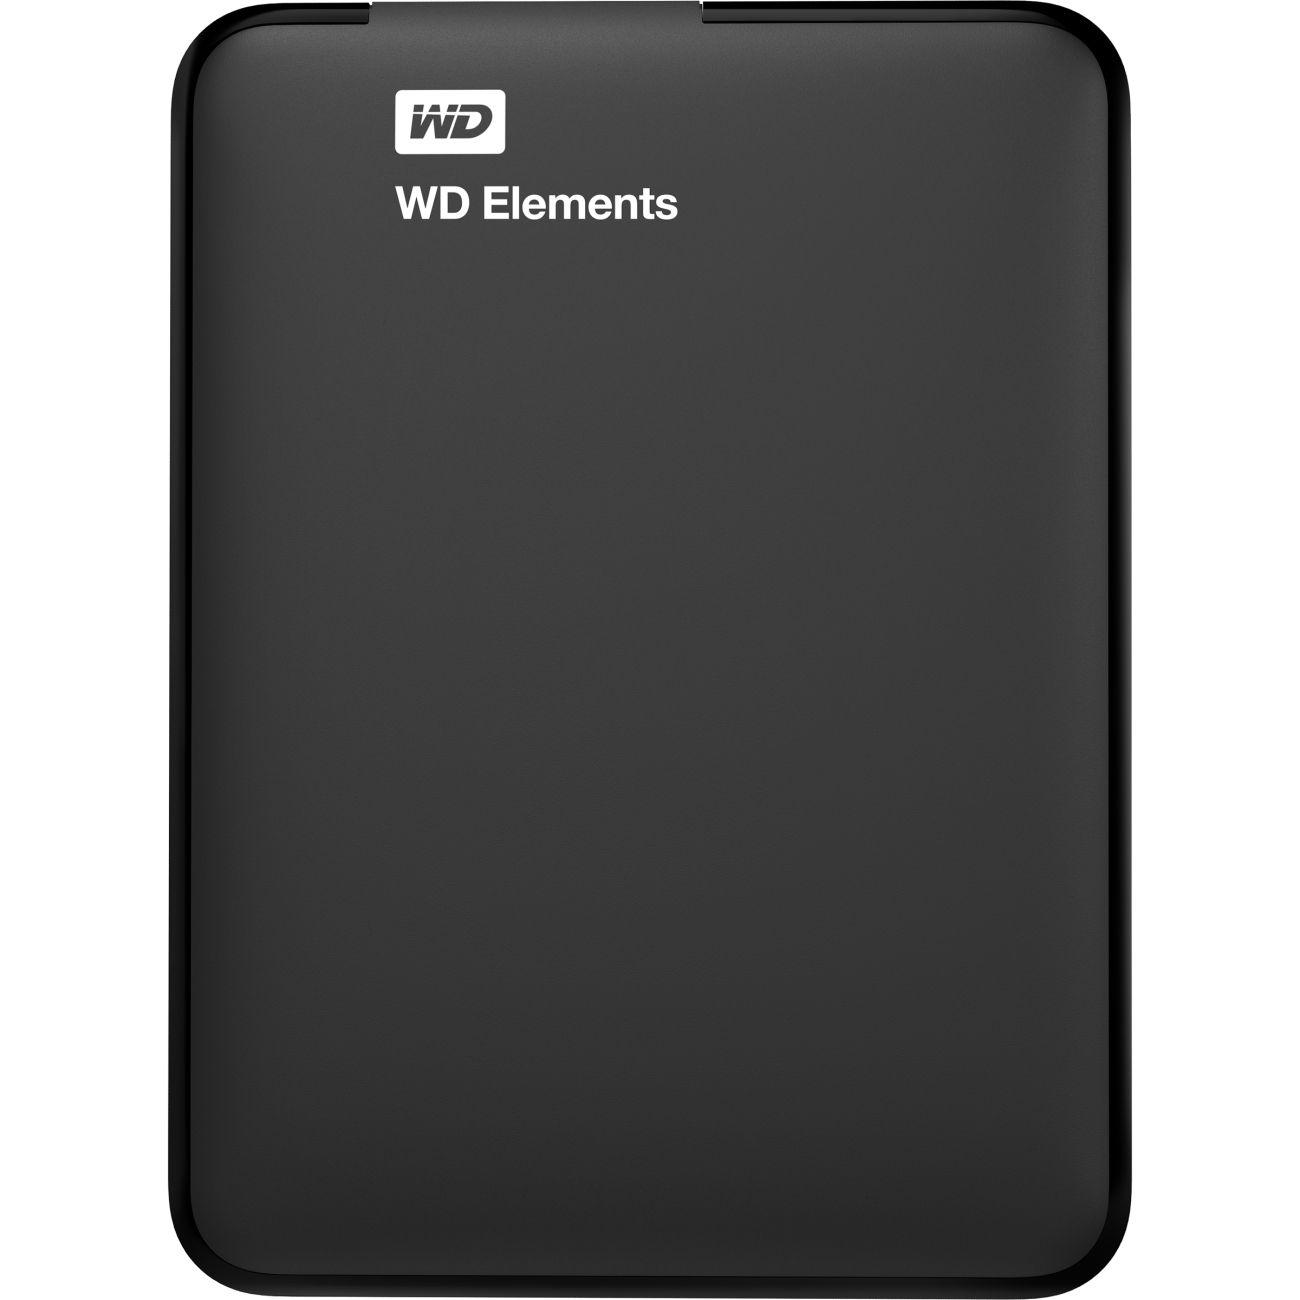 Жесткий диск WESTERN DIGITAL WDBU6Y0020BBK-EESN 2TB USB3 BLACK от Ravta